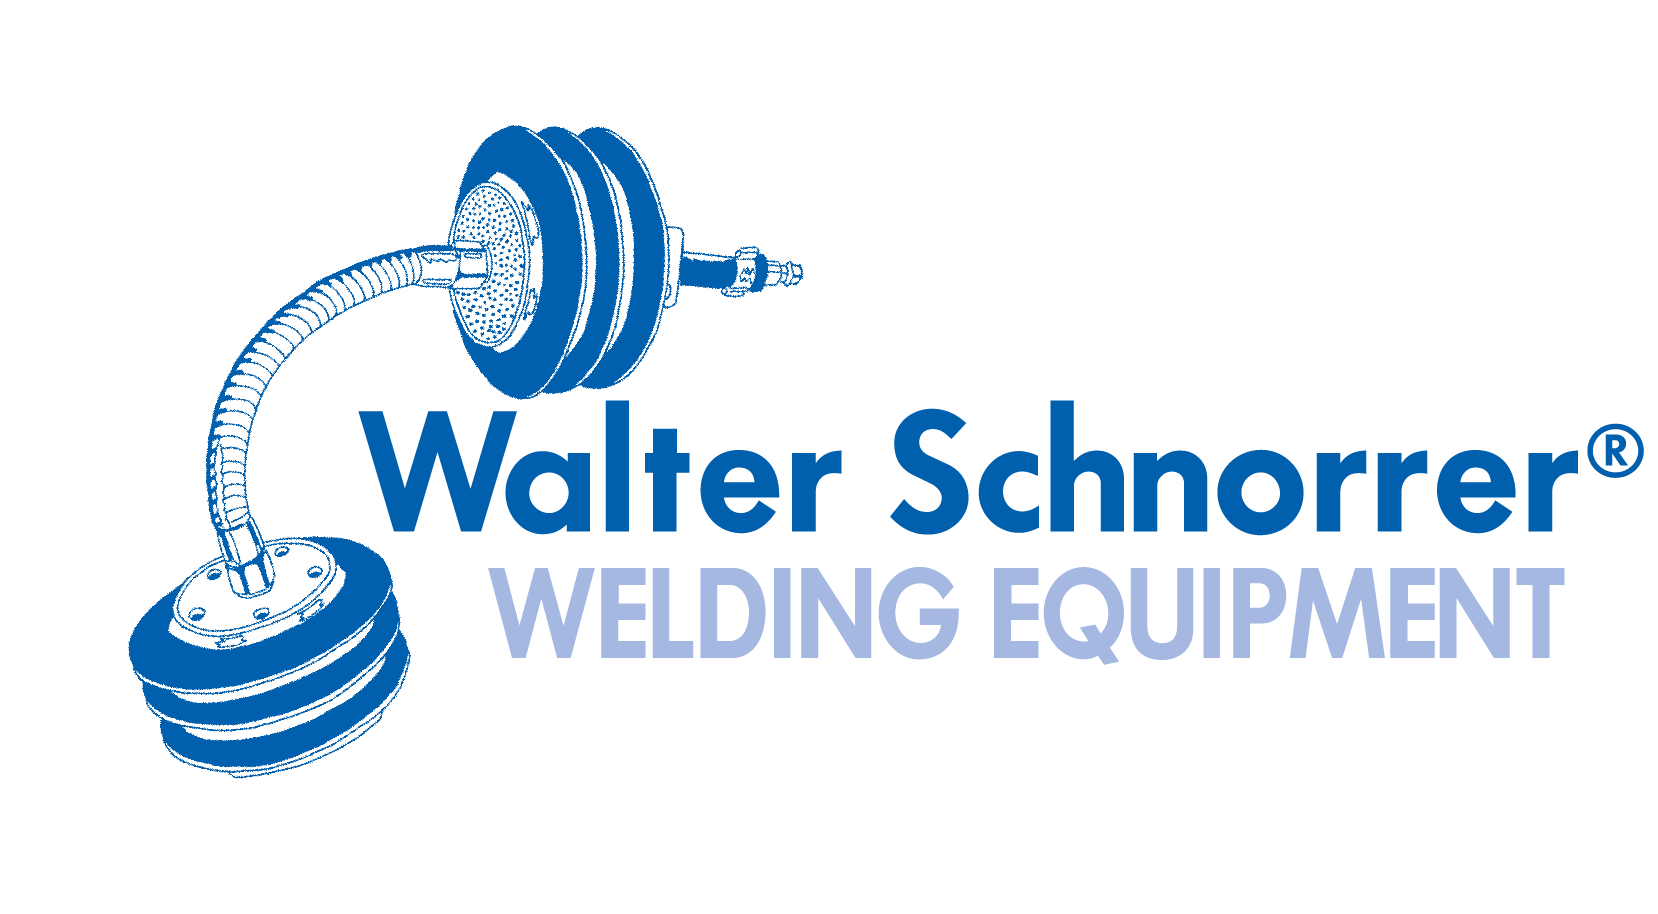 Walter Schnorrer ApS